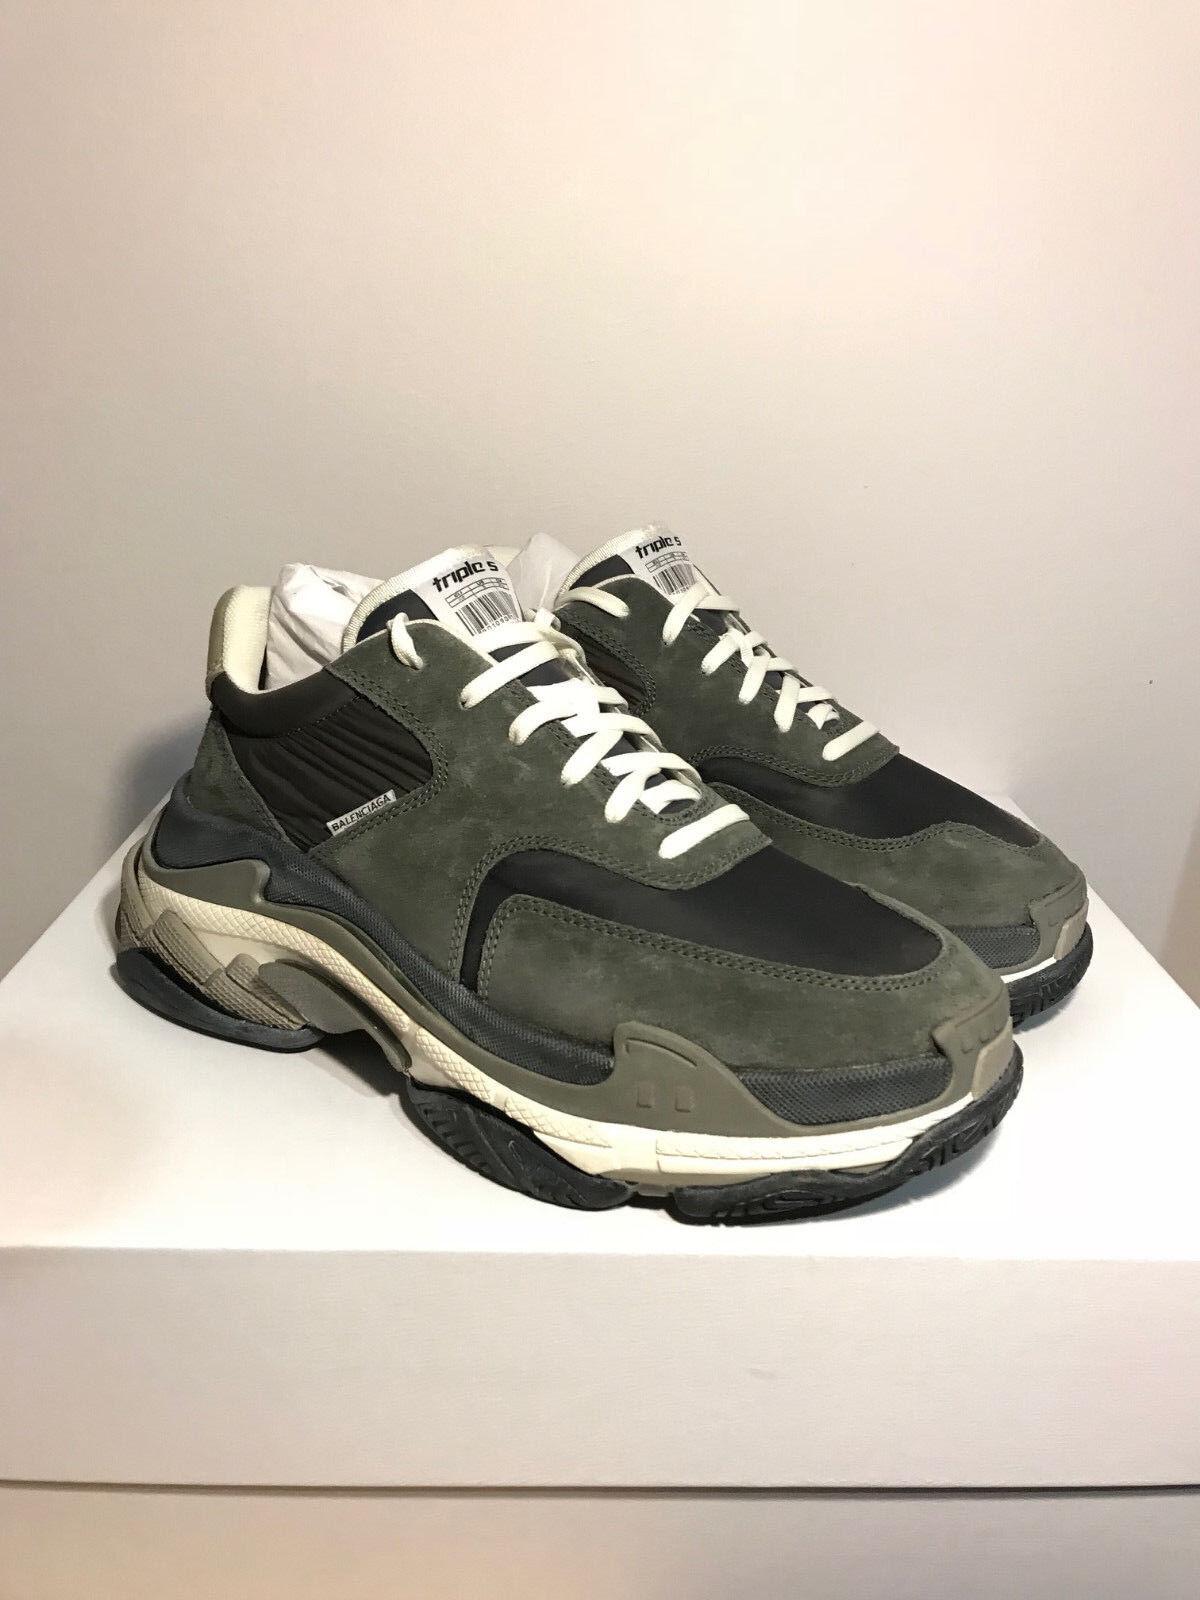 Authentic Balenciaga Triple S trainer sneakers OG US 9 EU 42 Men New GREY